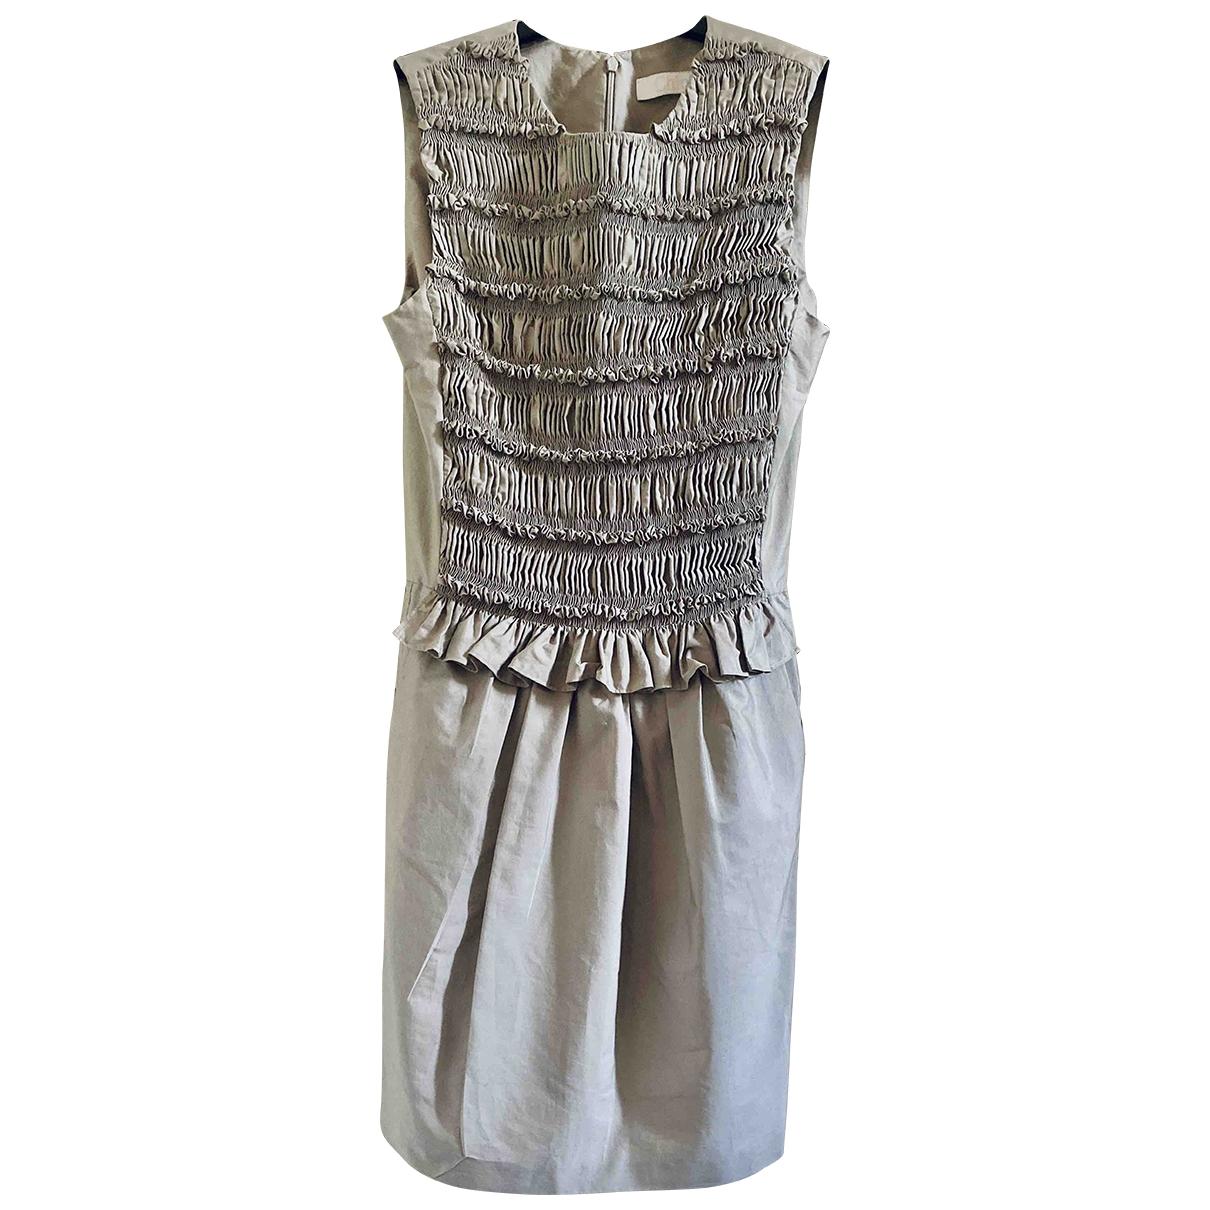 Chloé \N Grey Cotton dress for Women 36 FR